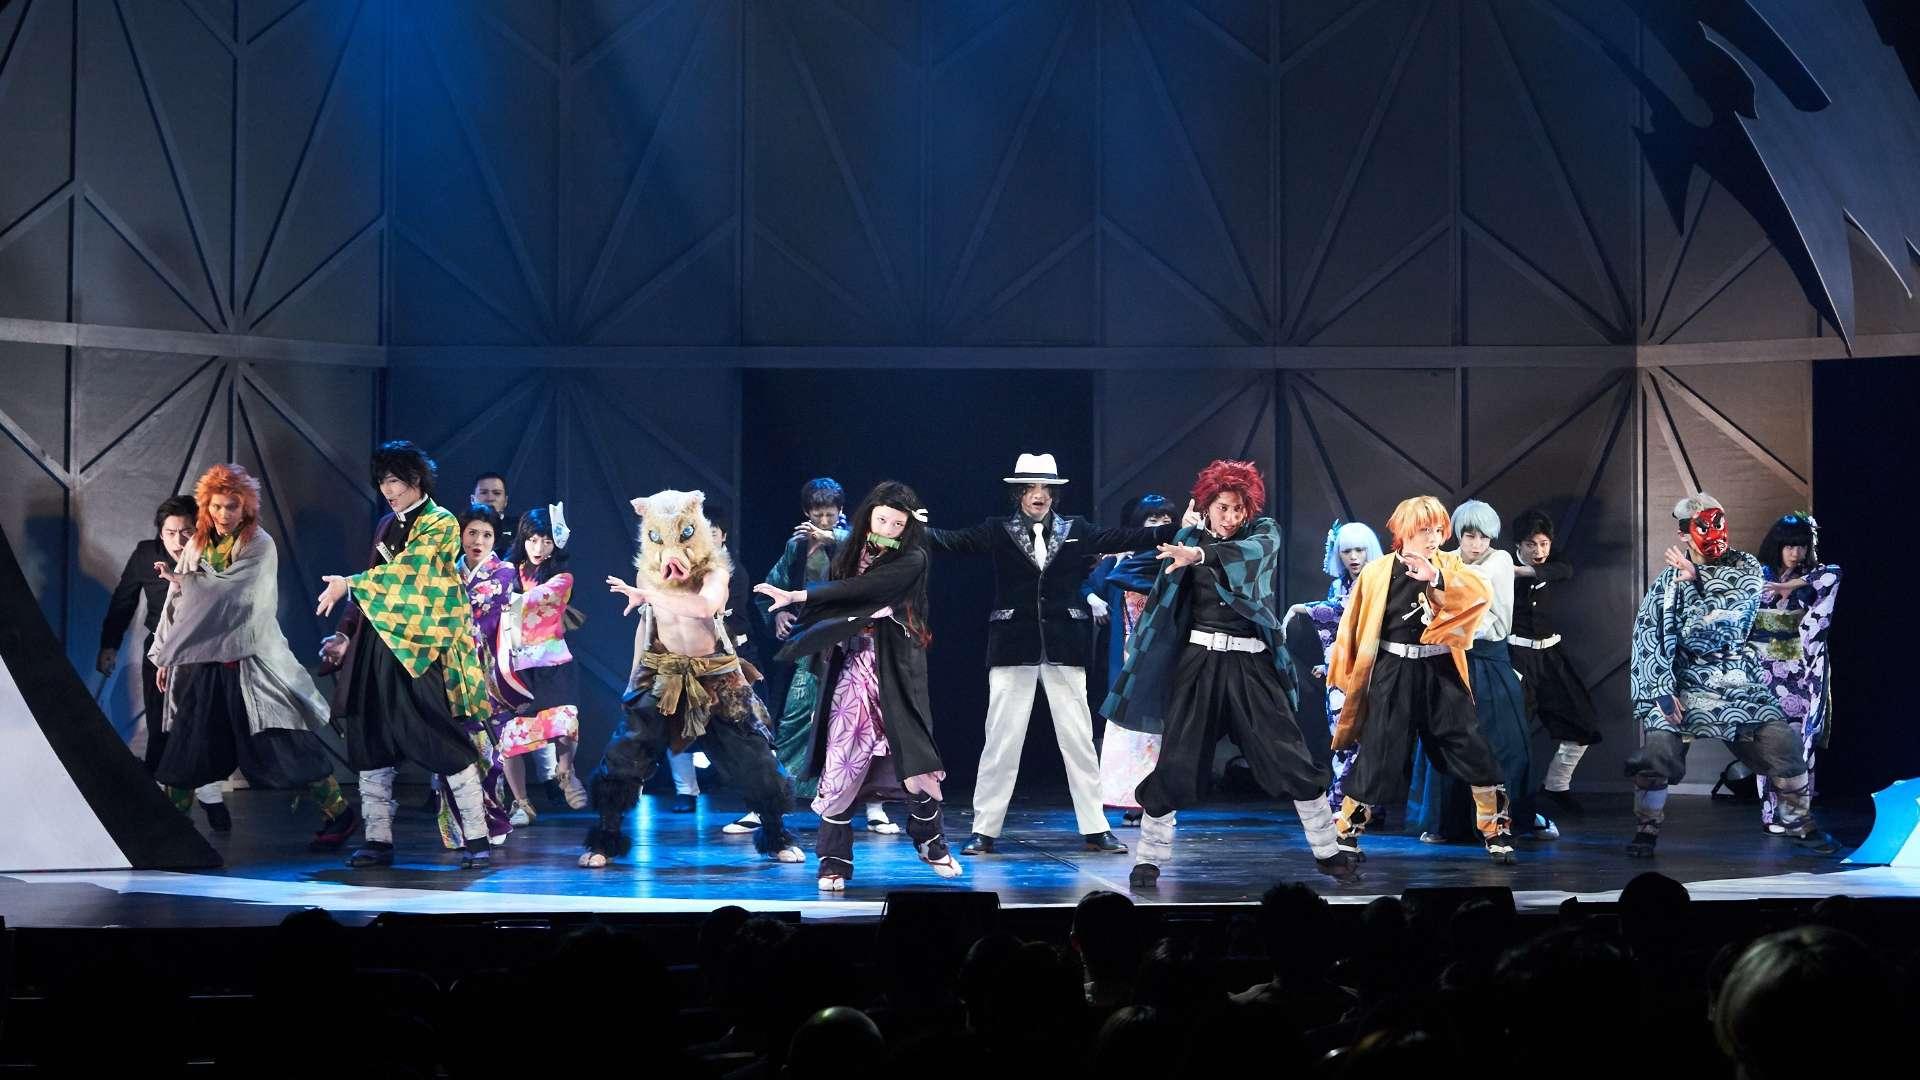 舞台「鬼滅の刃」